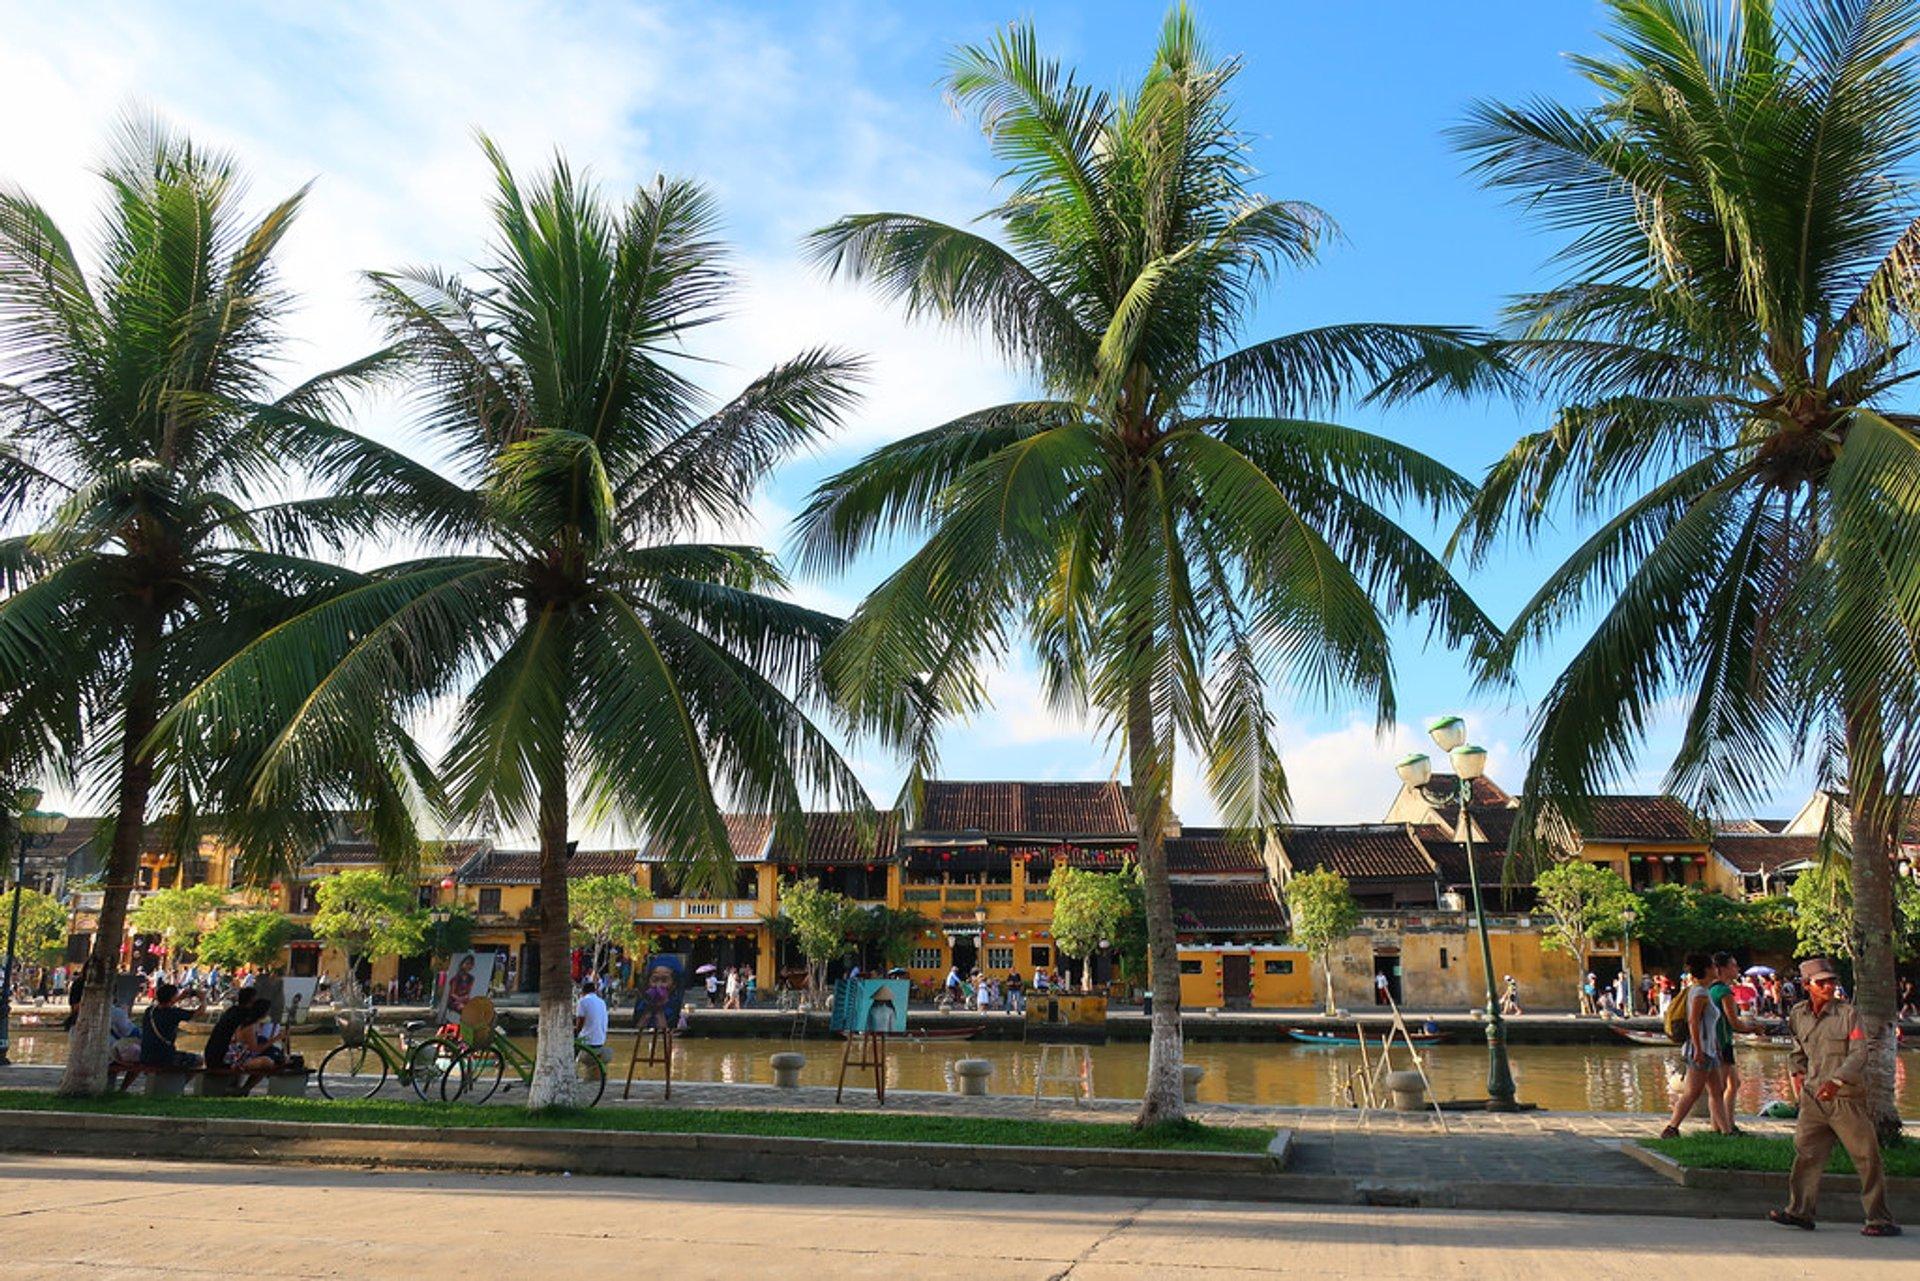 Central Vietnam Dry Season in Vietnam 2020 - Best Time